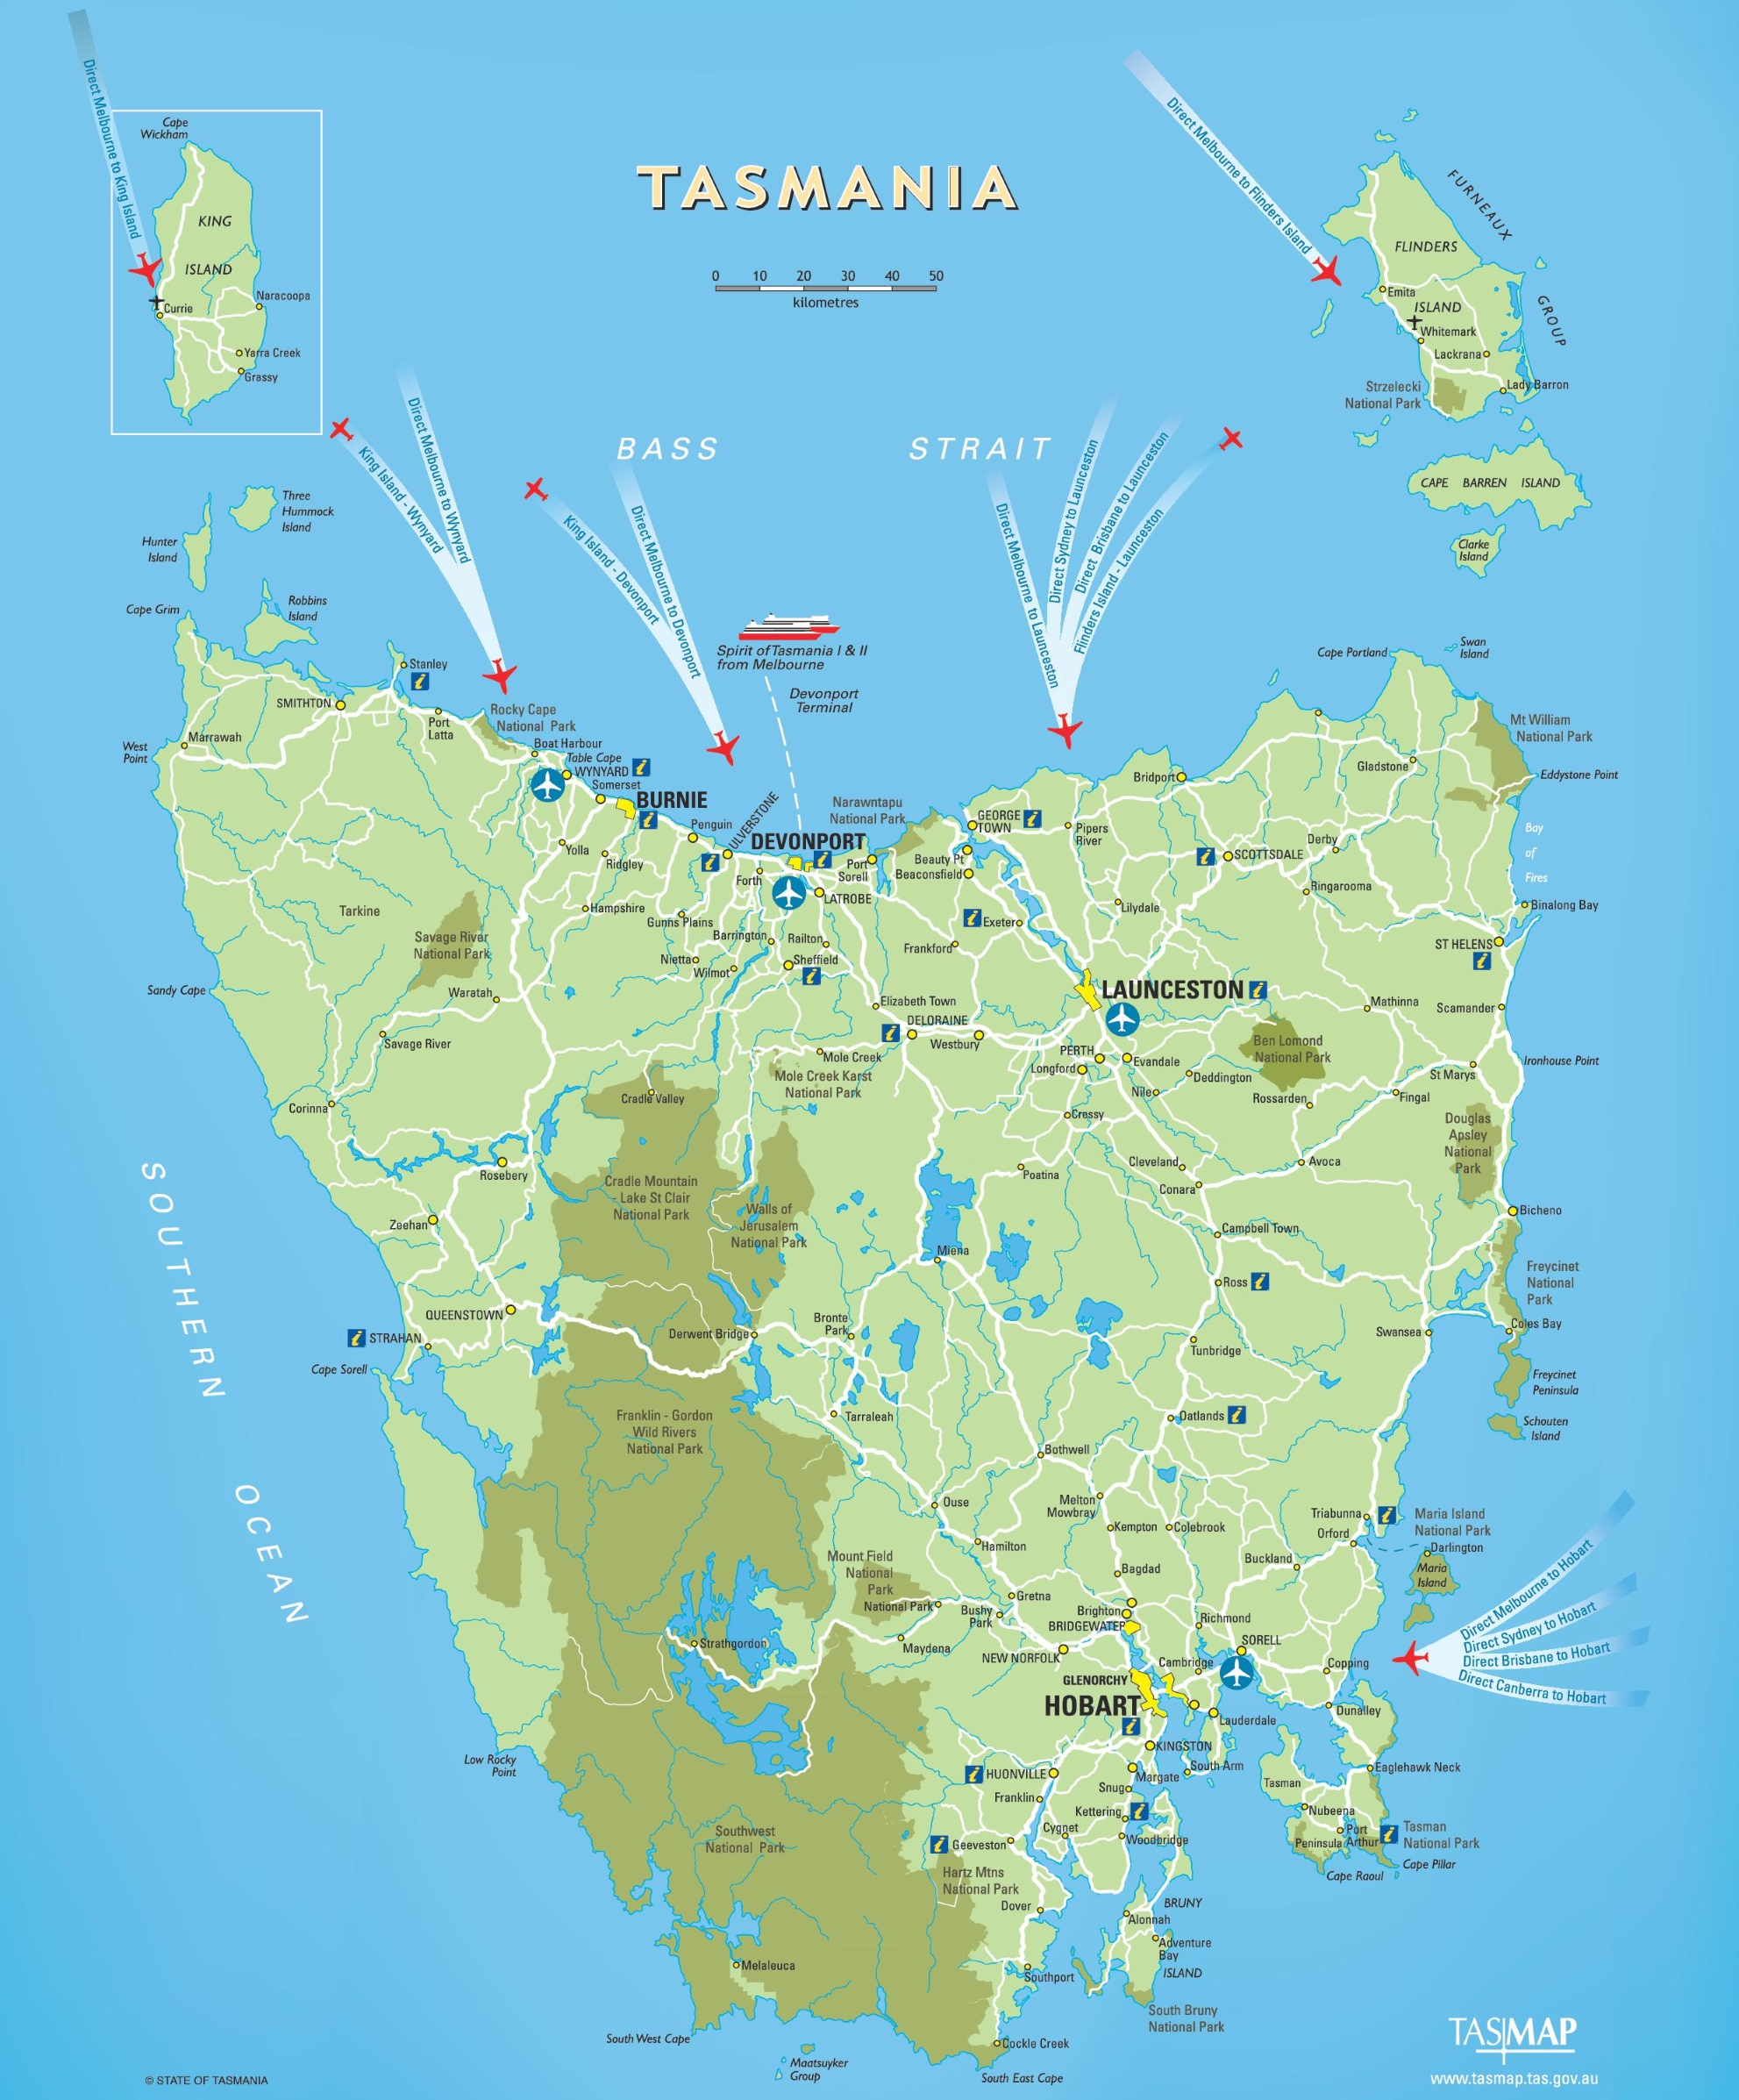 Tasmania Maps | Australia | Maps of Tasmania (TAS) on nigeria world map, tanzania world map, major deserts of the world map, crimea world map, manitoba world map, north island world map, bowen world map, minorca world map, gulf of carpentaria world map, indonesia world map, new guinea world map, hobart world map, bismarck archipelago world map, australia world map, flinders island world map, philippines world map, cambridge world map, cape barren island world map, bass strait world map, new zealand world map,